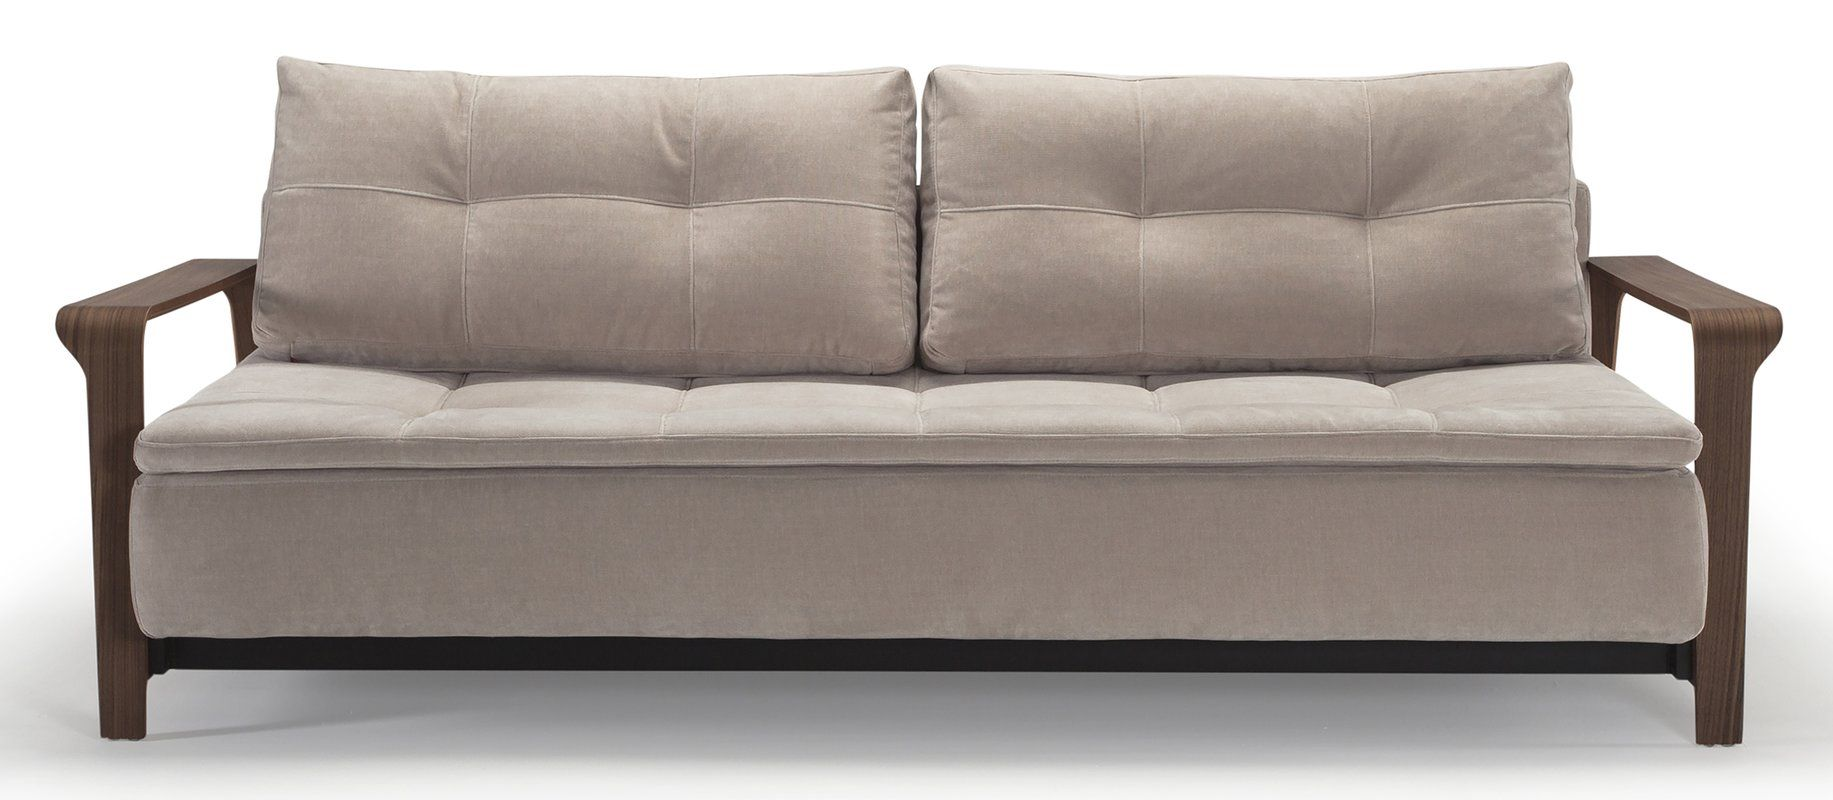 Alto sleeper sofa newlywed home pinterest sleeper sofas